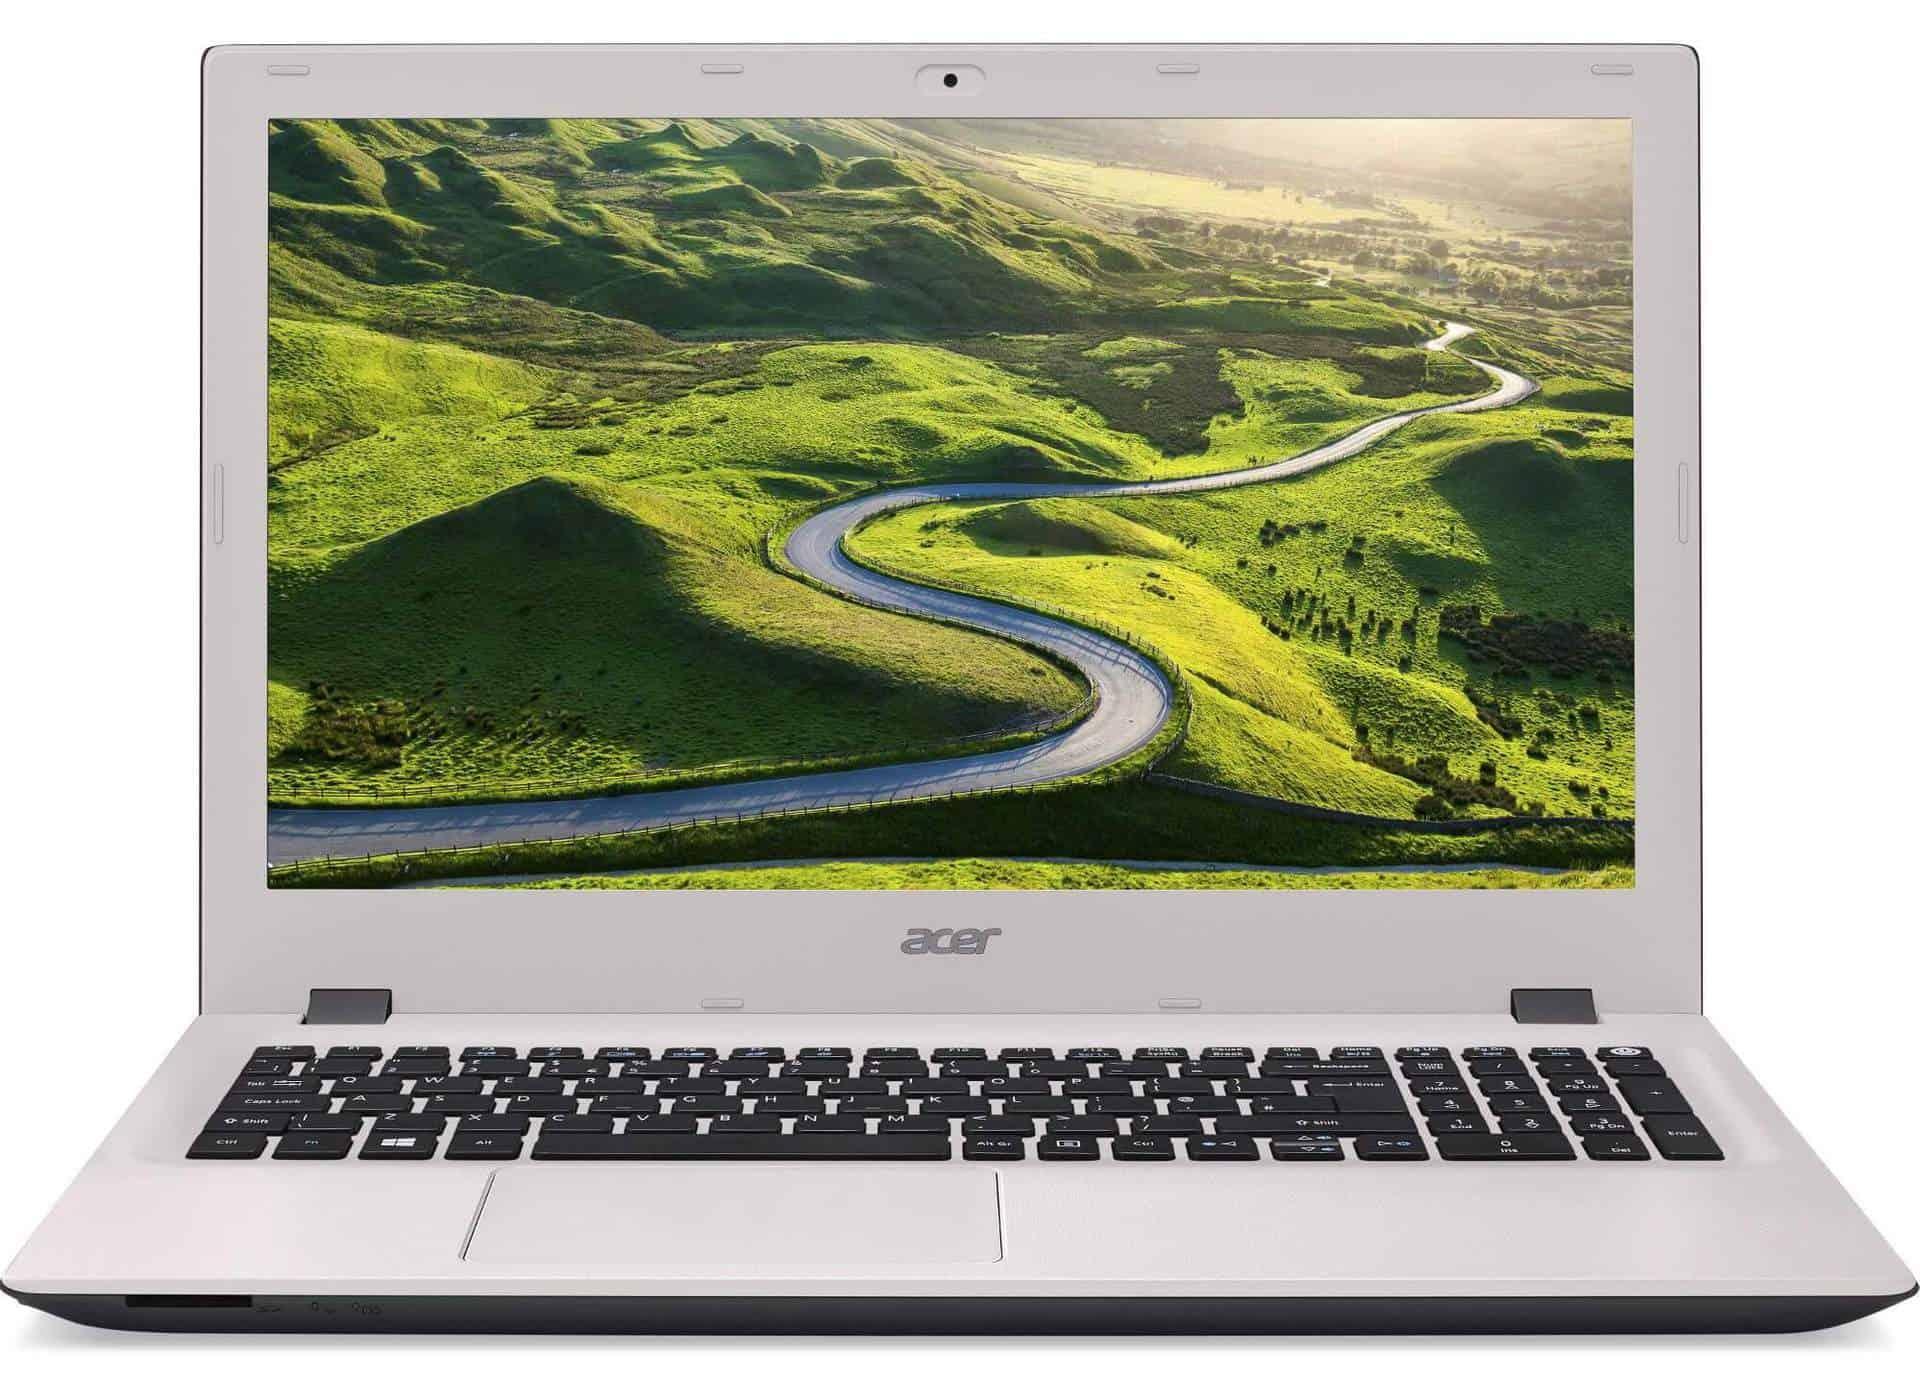 Acer E5-573G-34JM